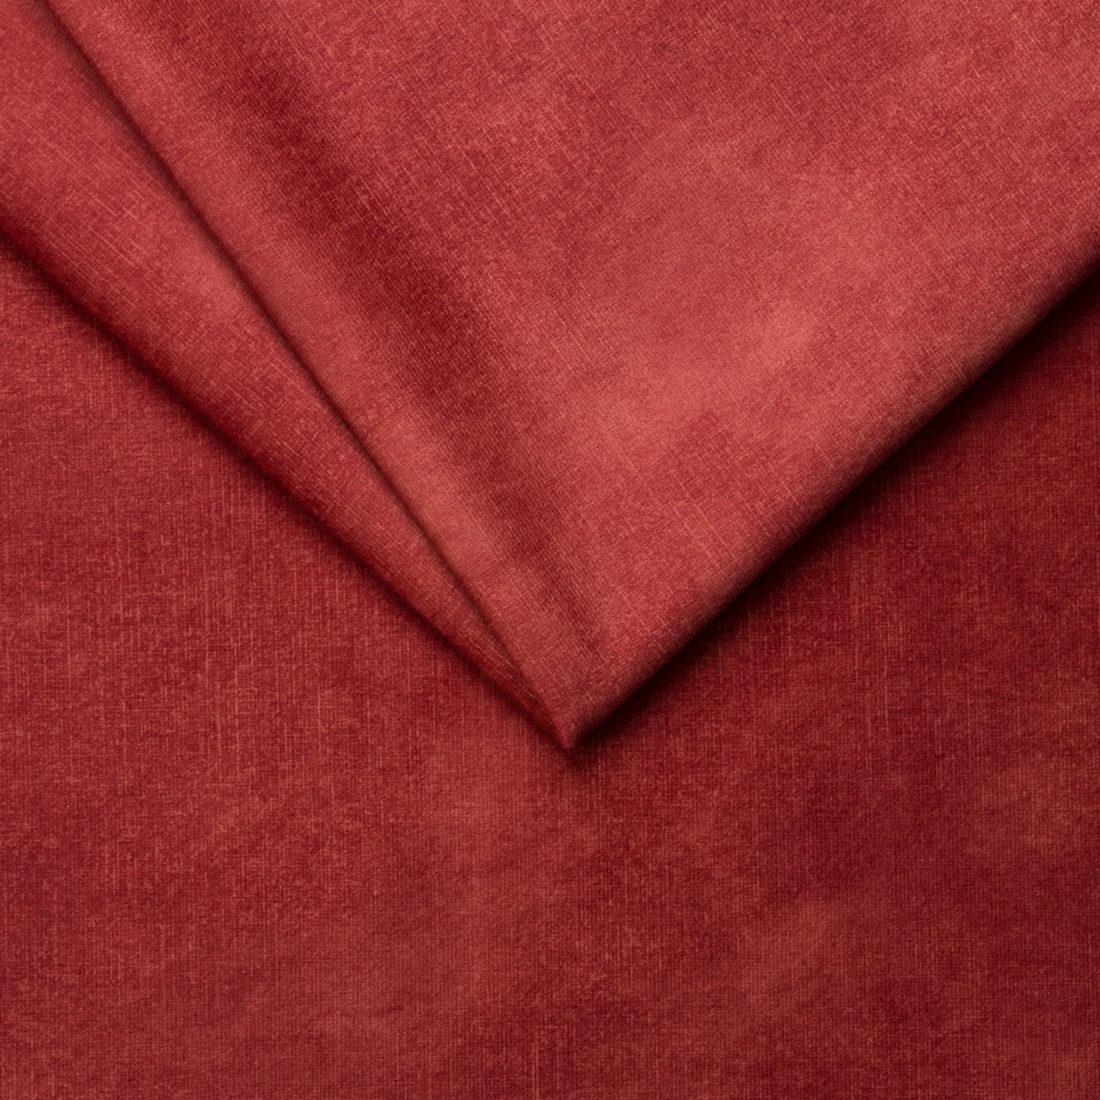 Мебельная ткань Palladium 7 Coral, велюр